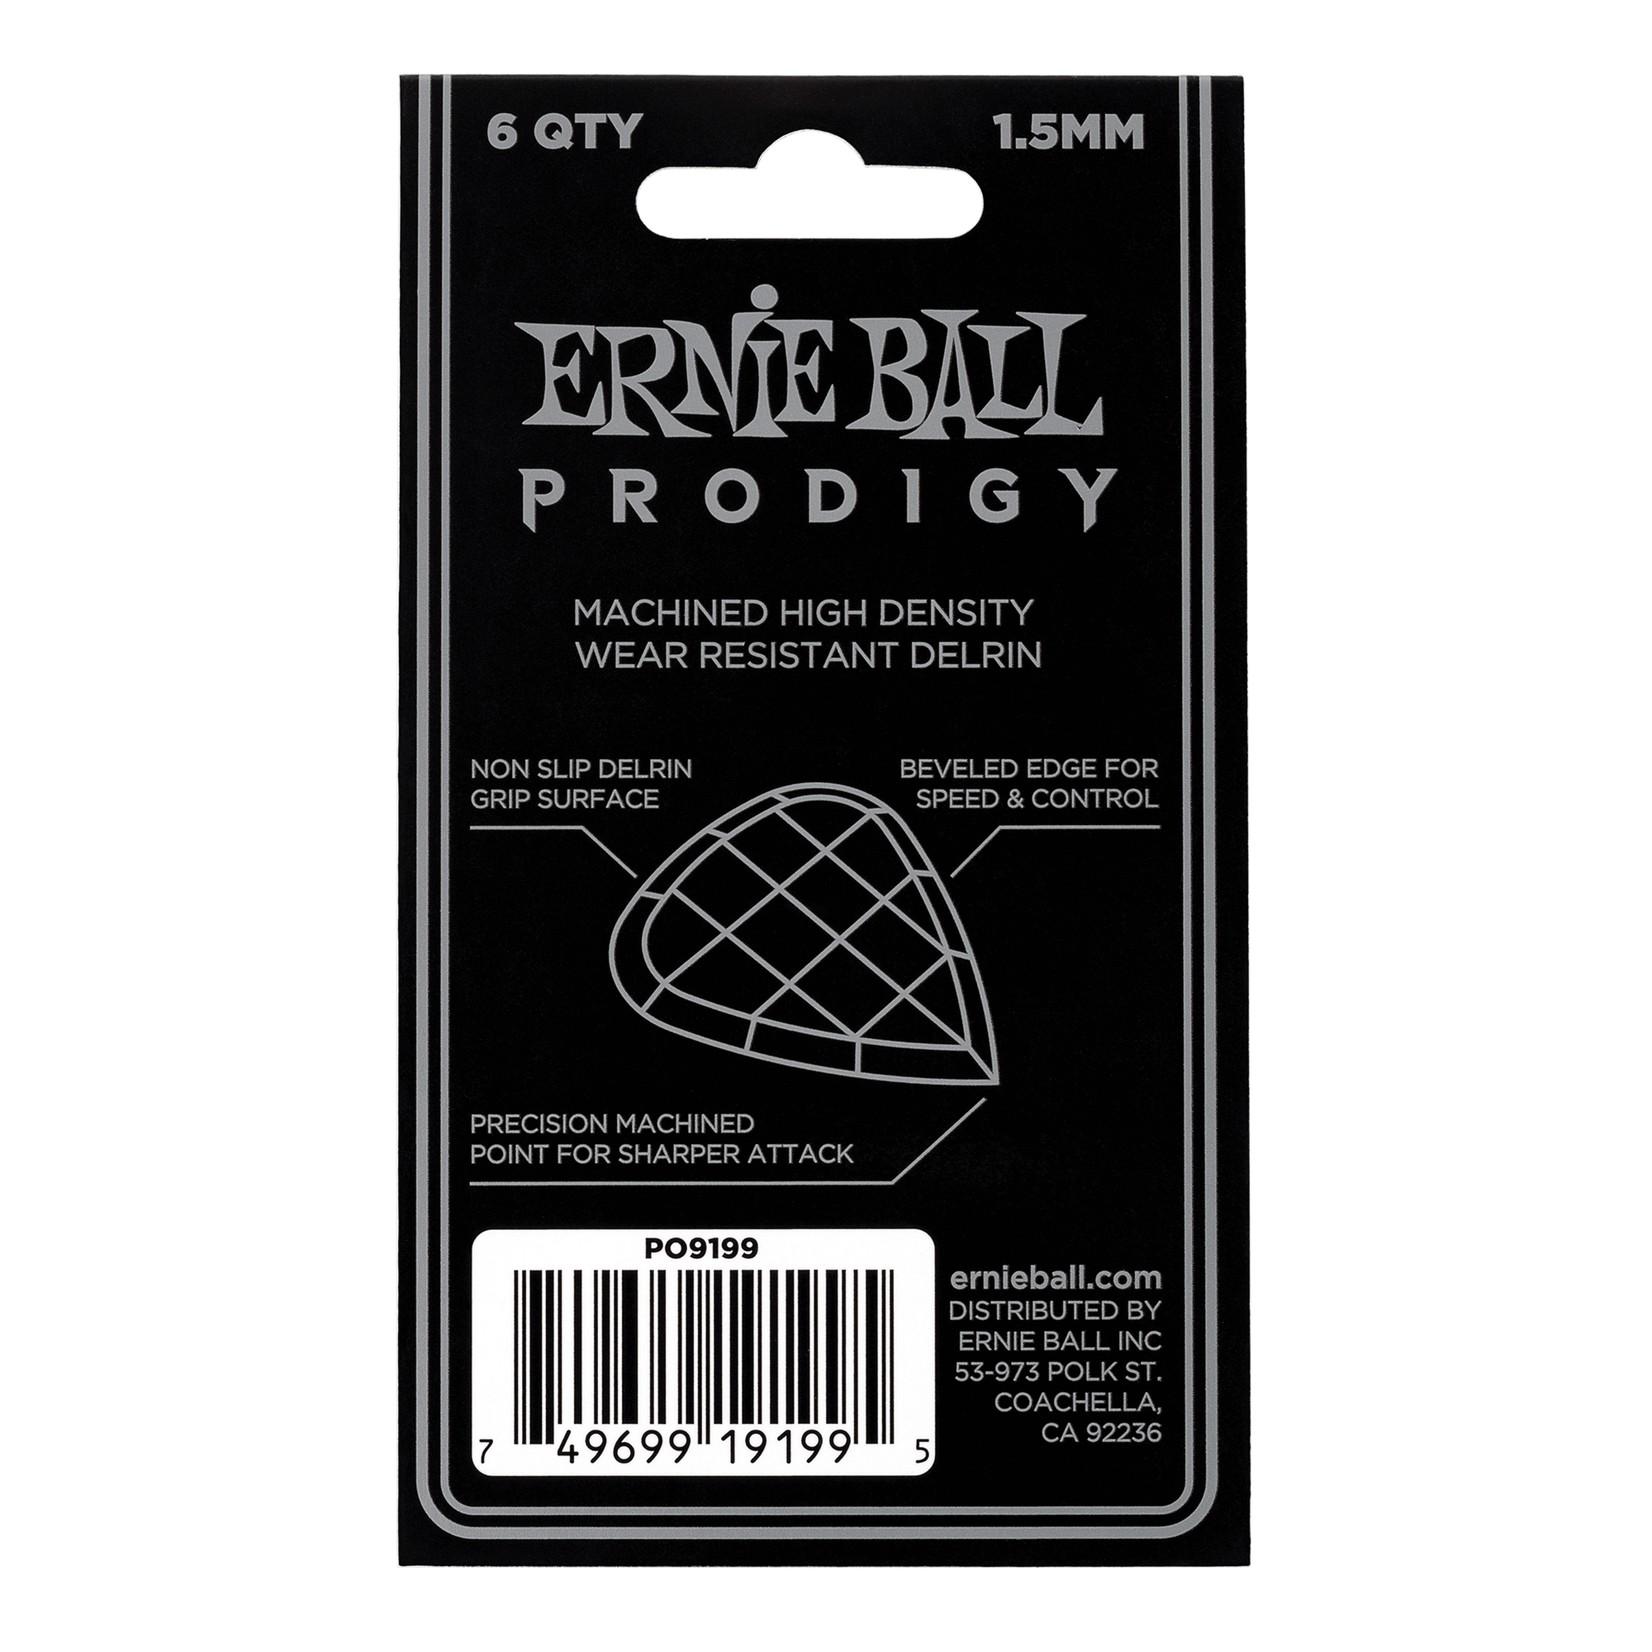 Ernie Ball Ernie Ball 1.5mm Black Standard Prodigy Picks 6-Pack (P09199)